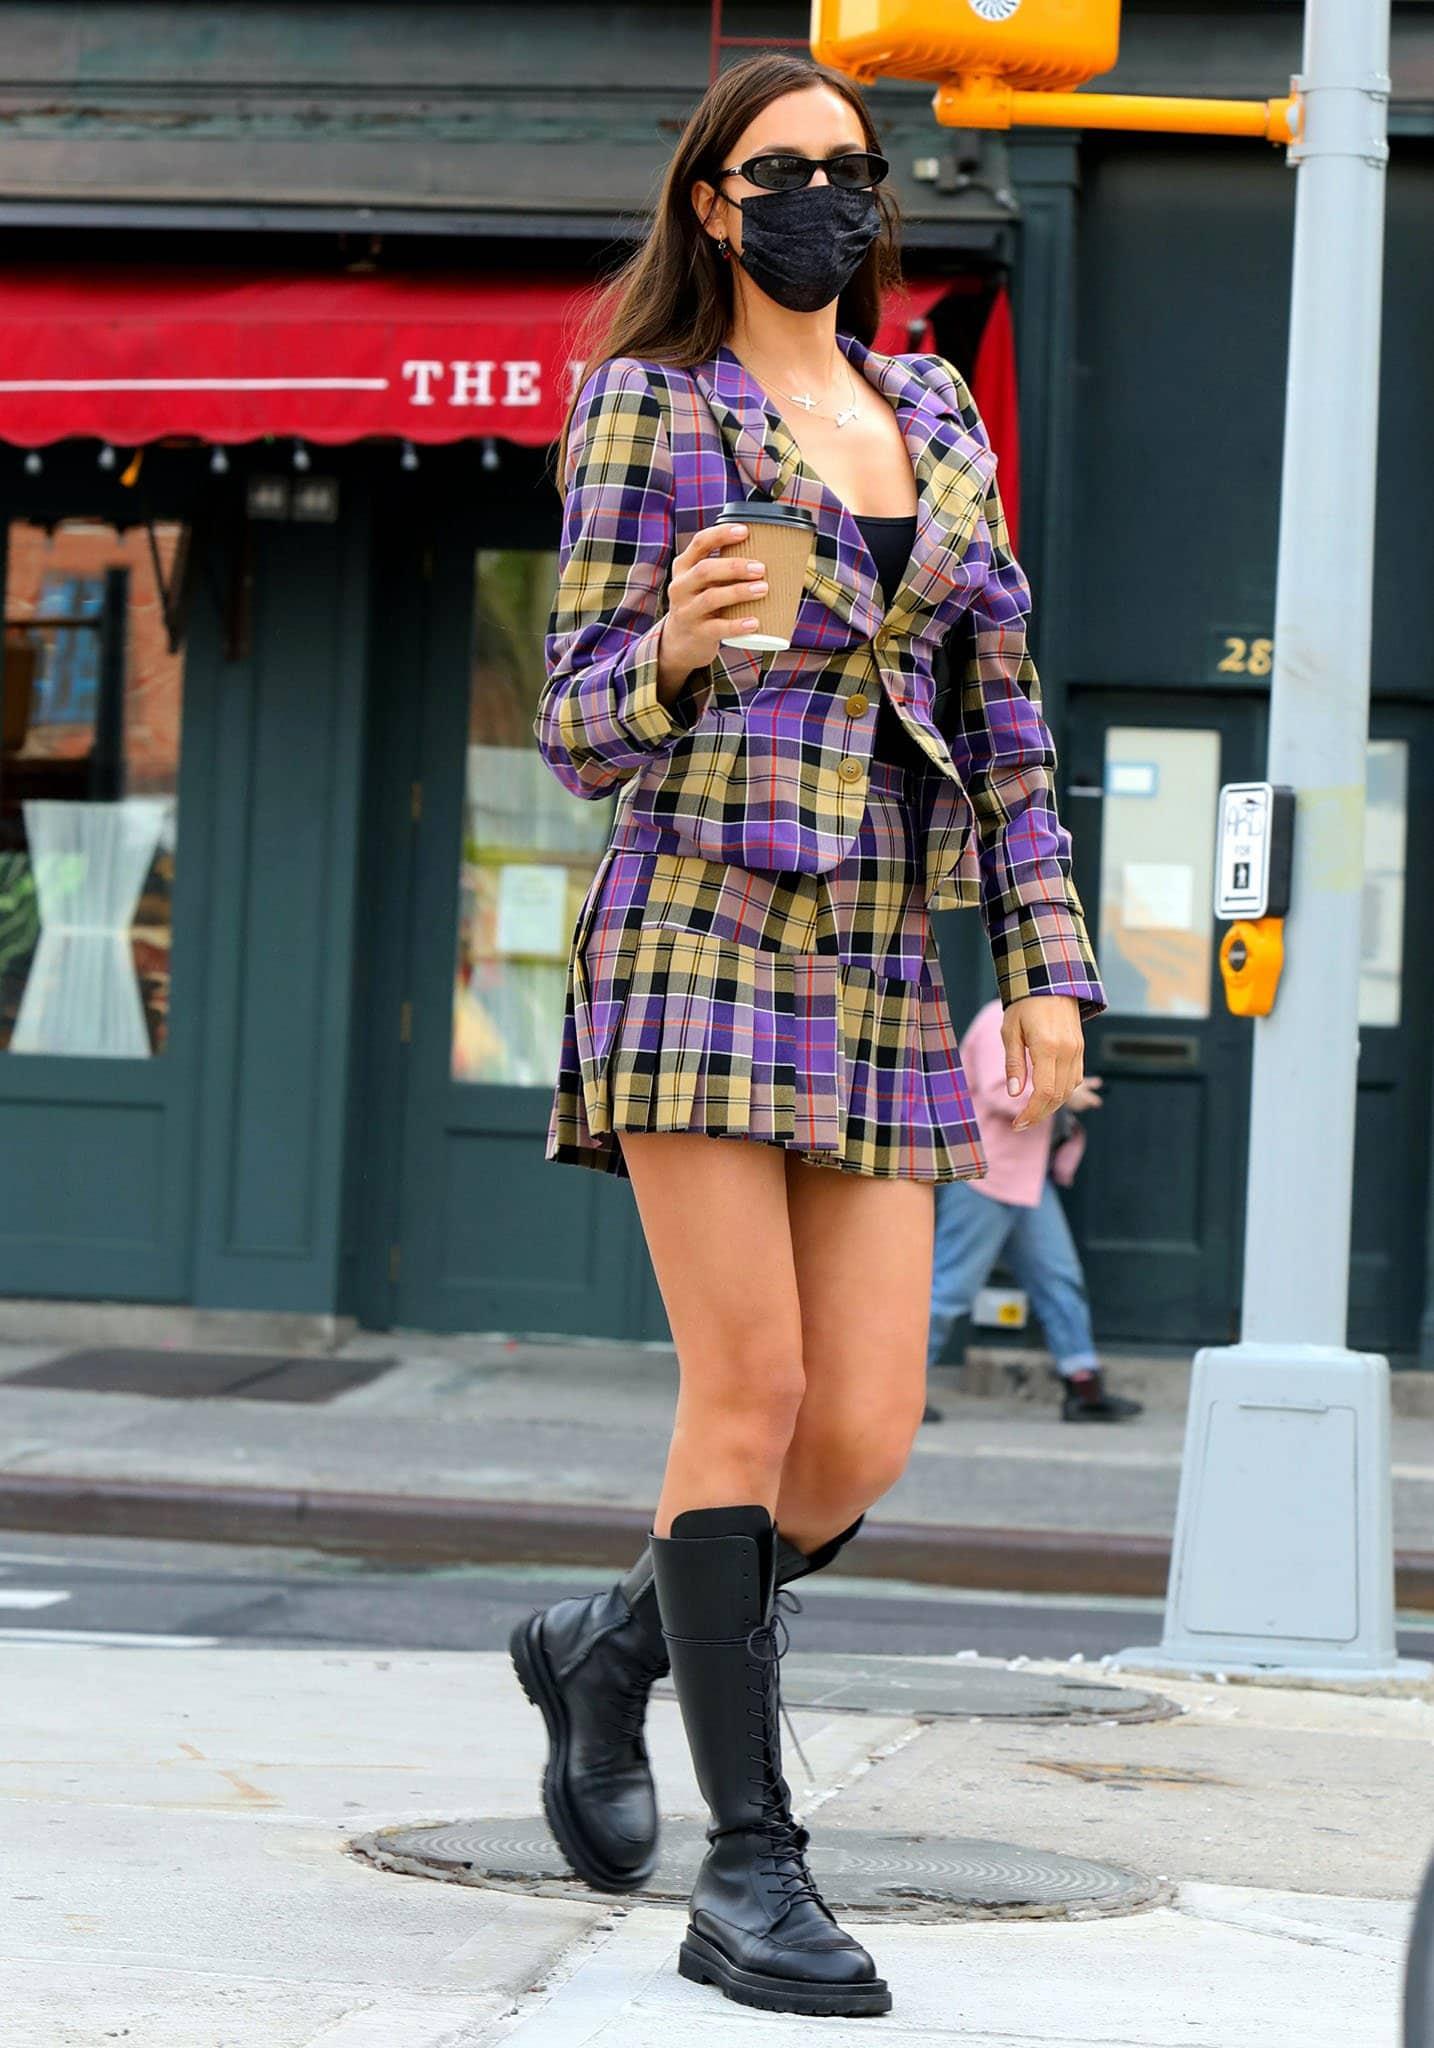 Irina Shayk channels Clueless' Cher Horowitz in Vivienne Westwood F/W RTW 2021 plaid jacket and skirt